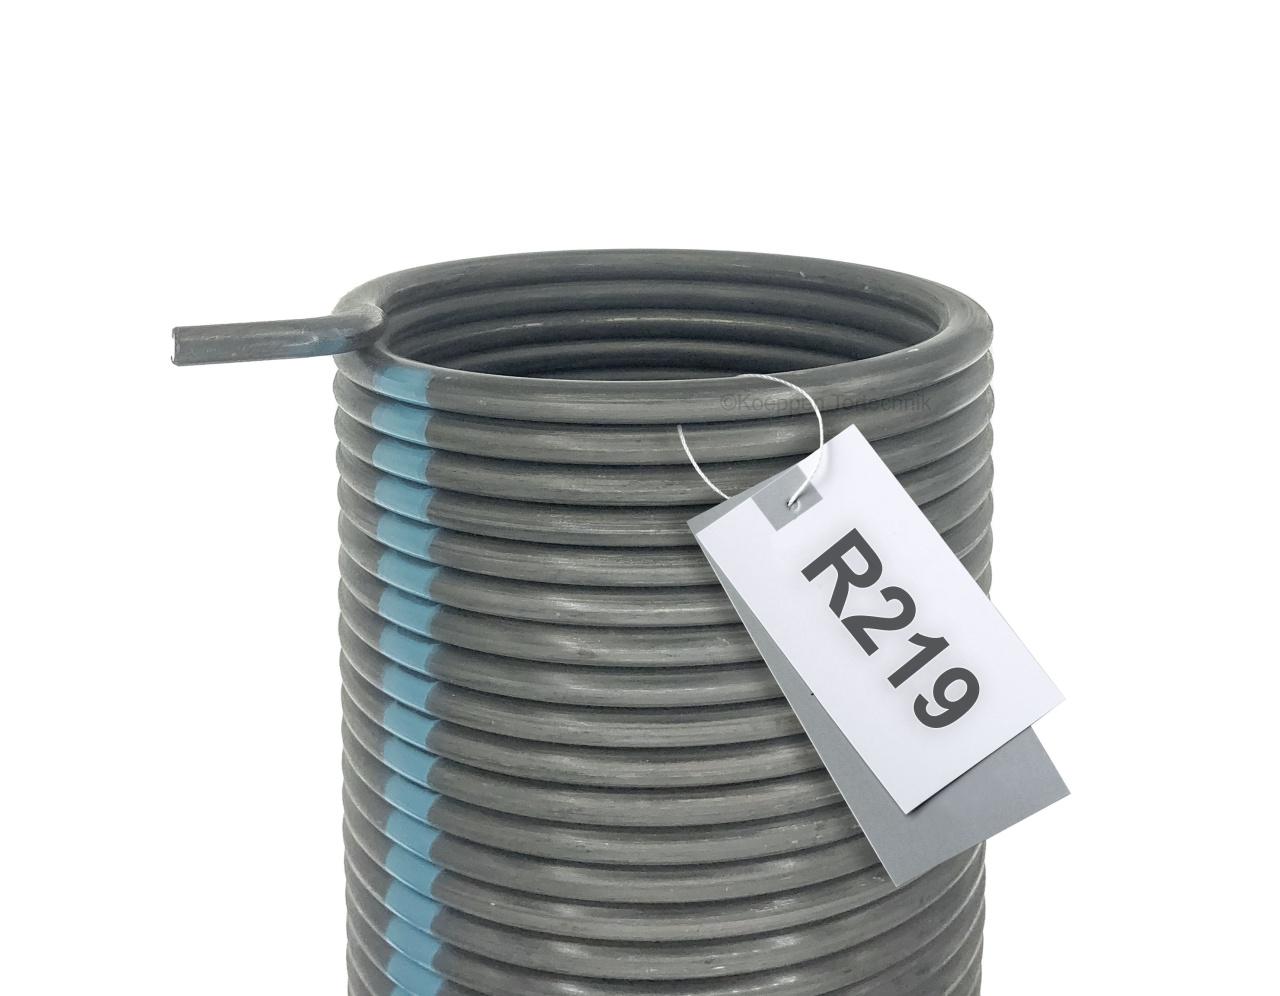 Torsionsfeder R219 passend zu Hörmann Industrie Sectionaltor